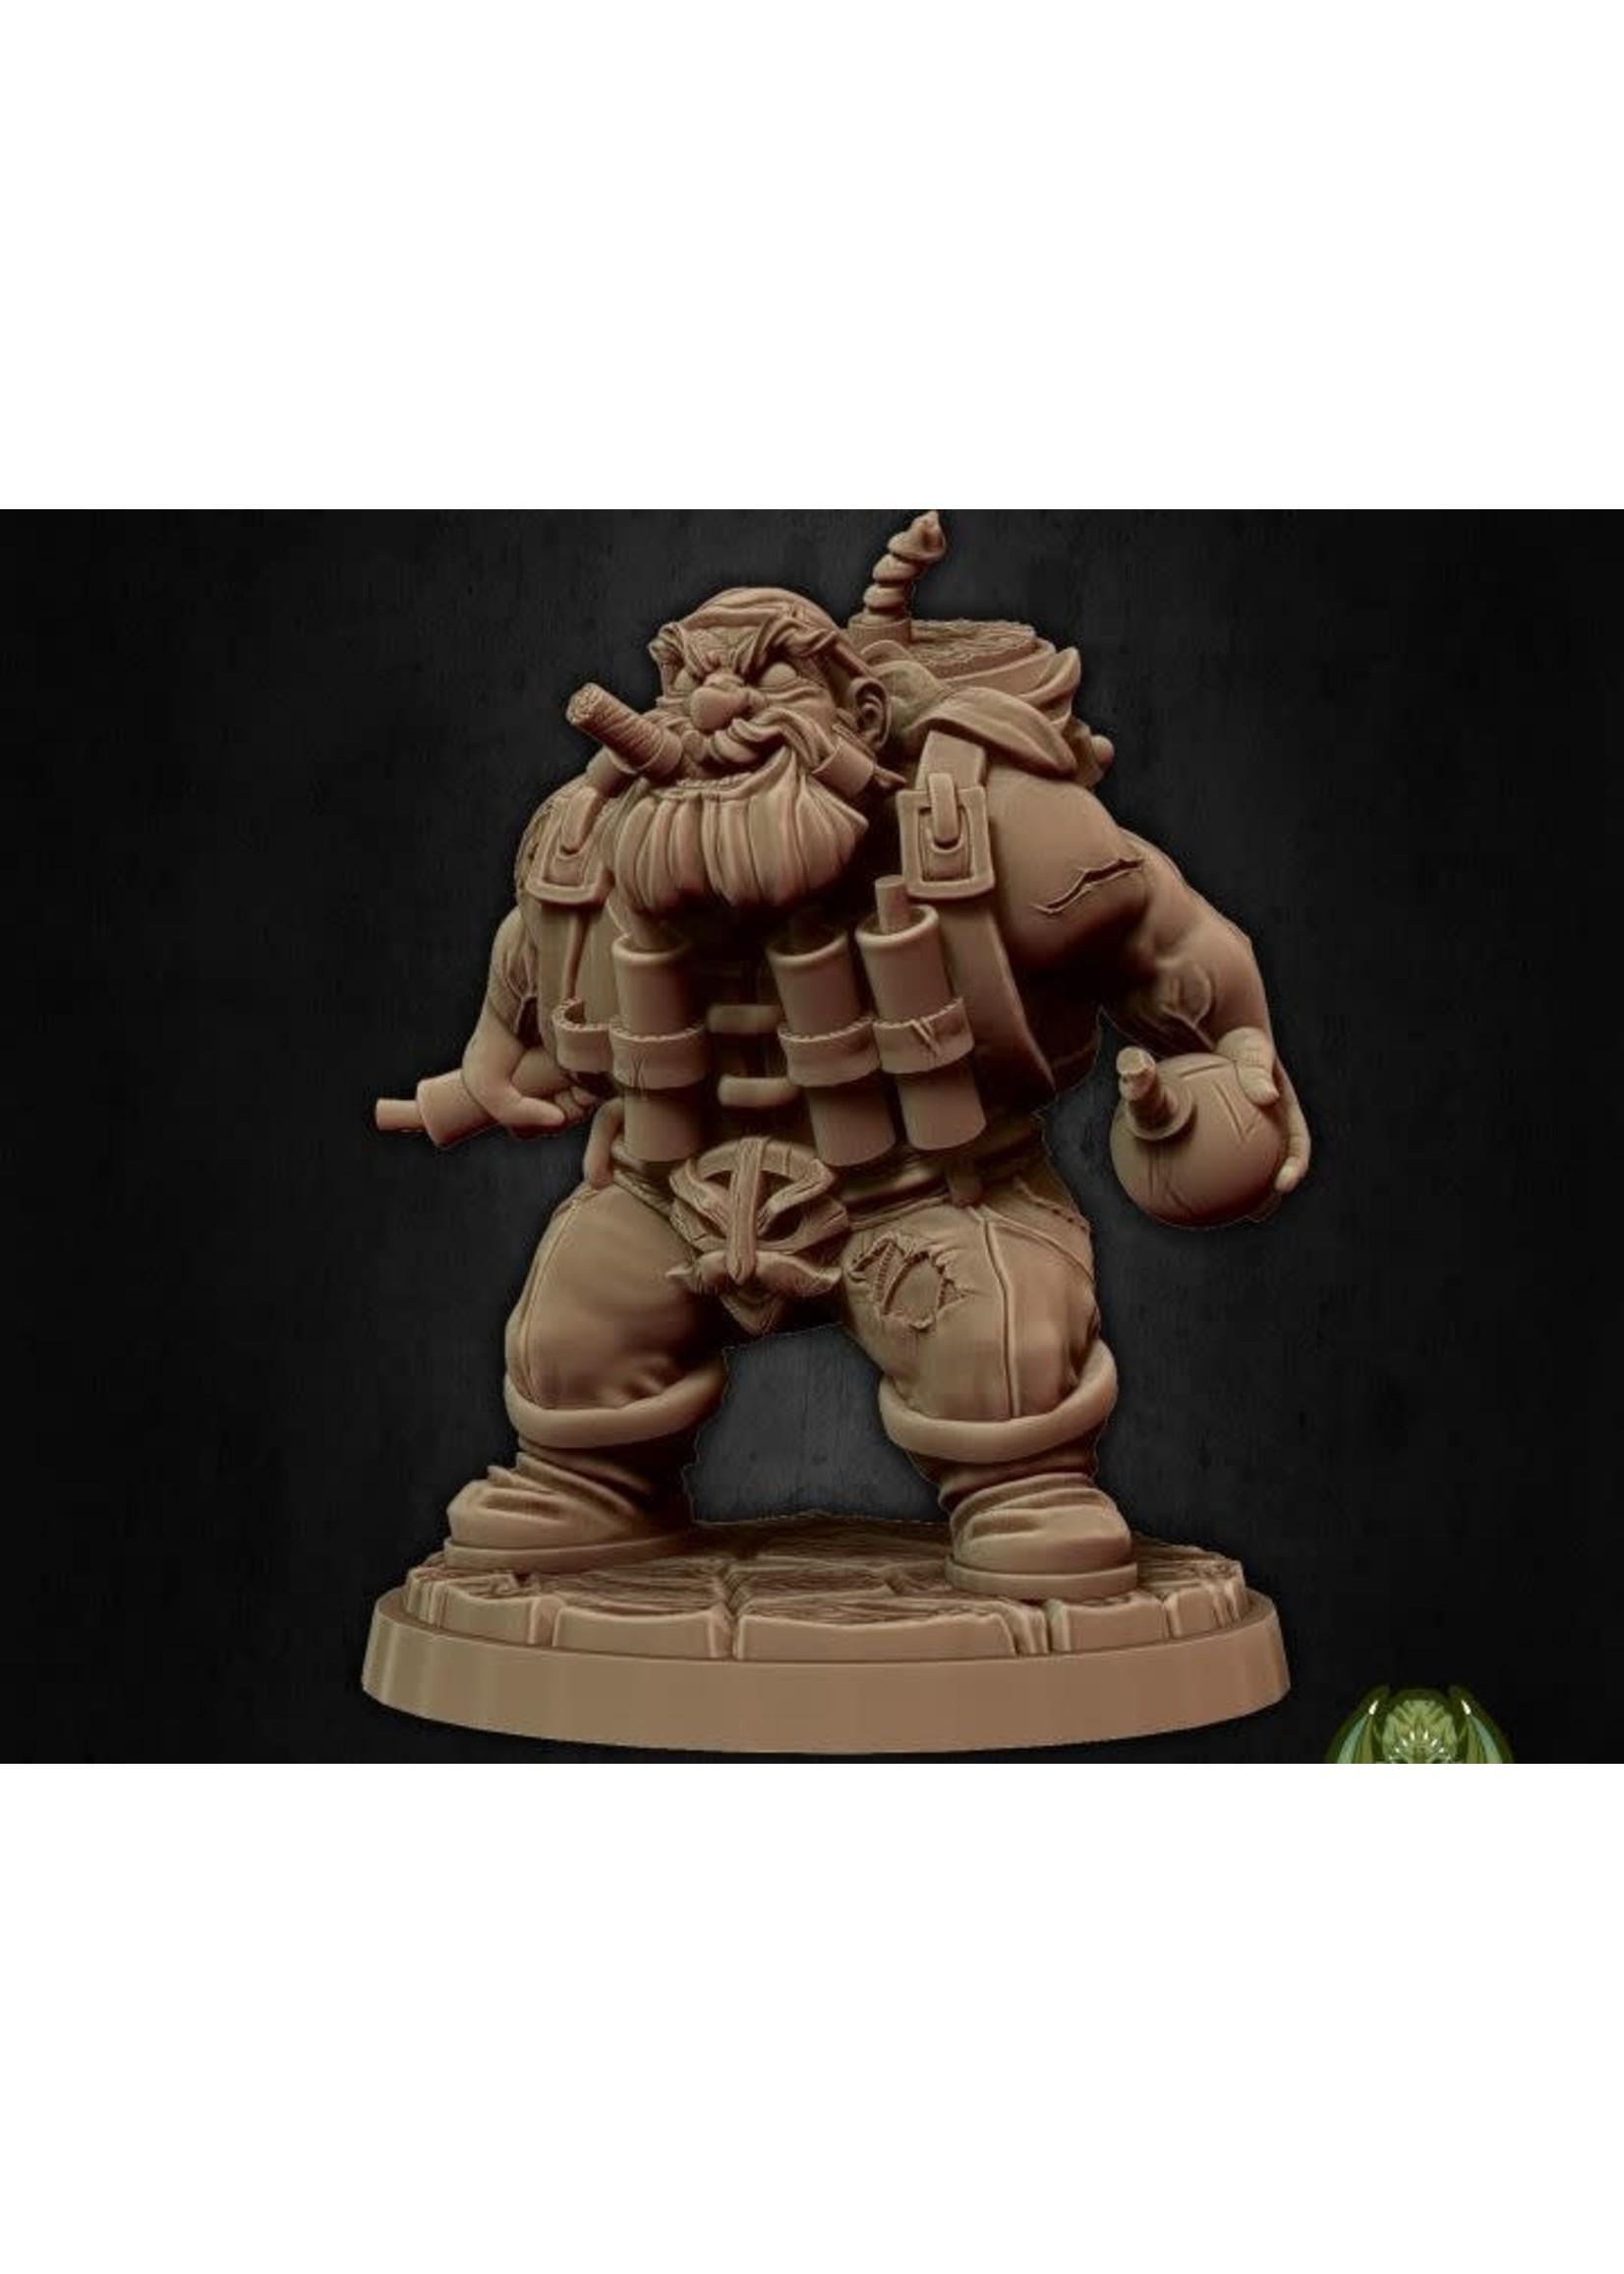 Dwari The Dynamiter (Hold My Dwarf Ks)